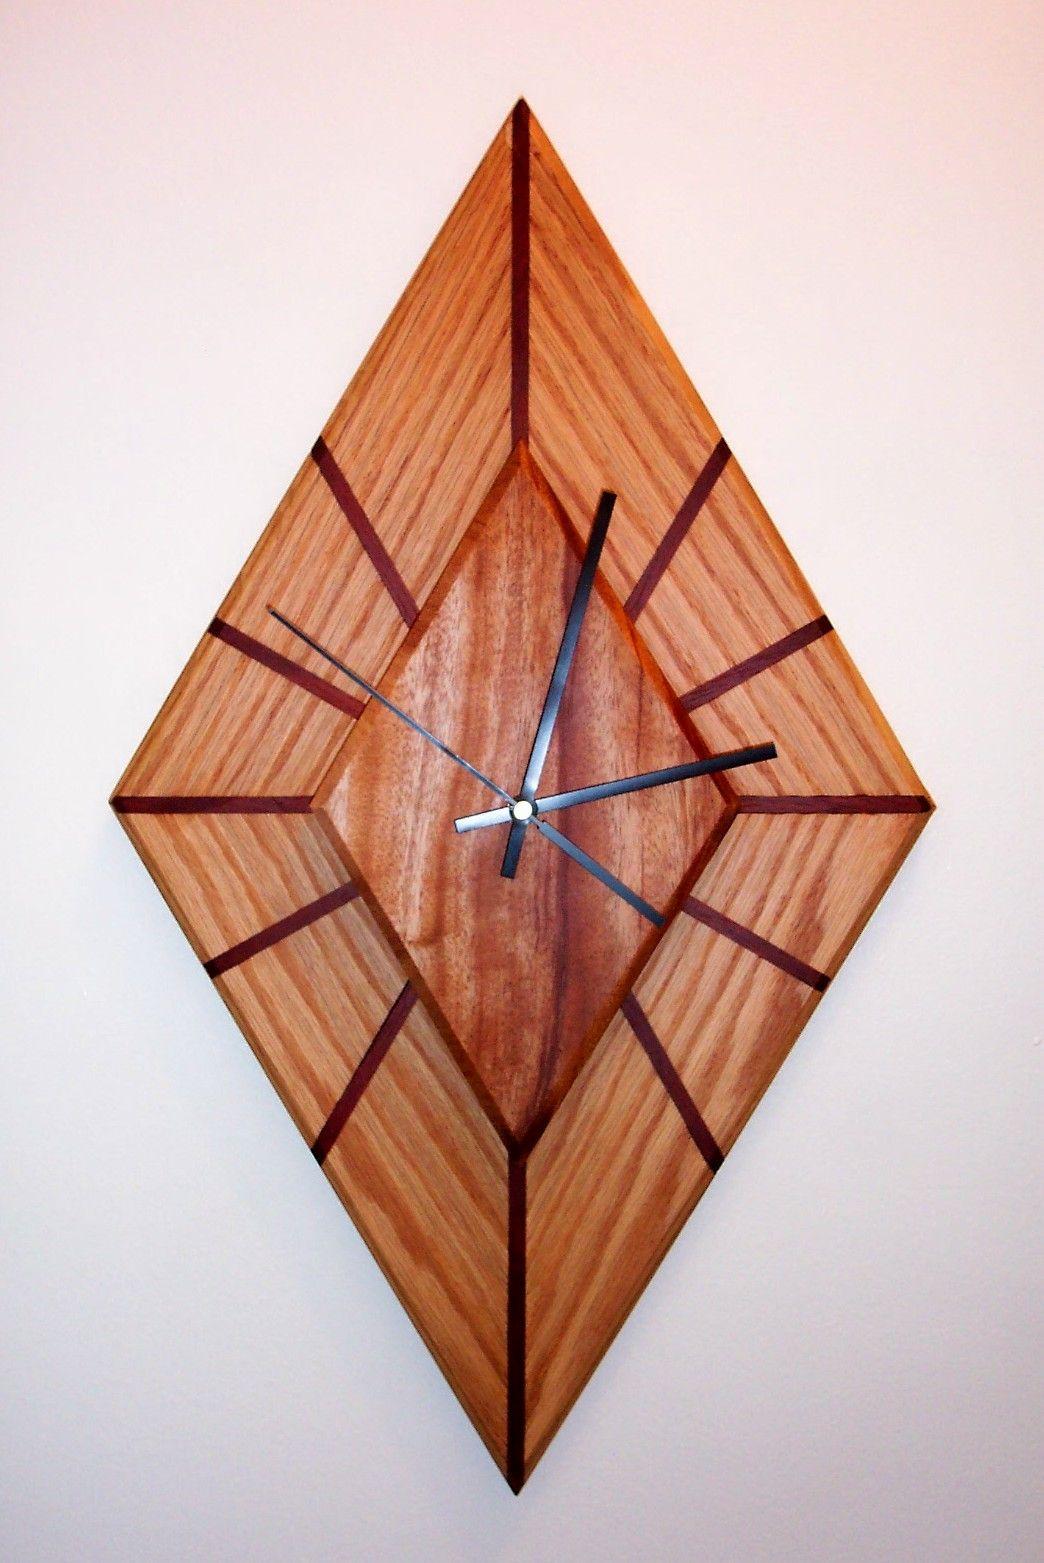 Diamond shaped clock inspired by klockit pinterest clocks diamond shaped clock gamestrikefo Gallery